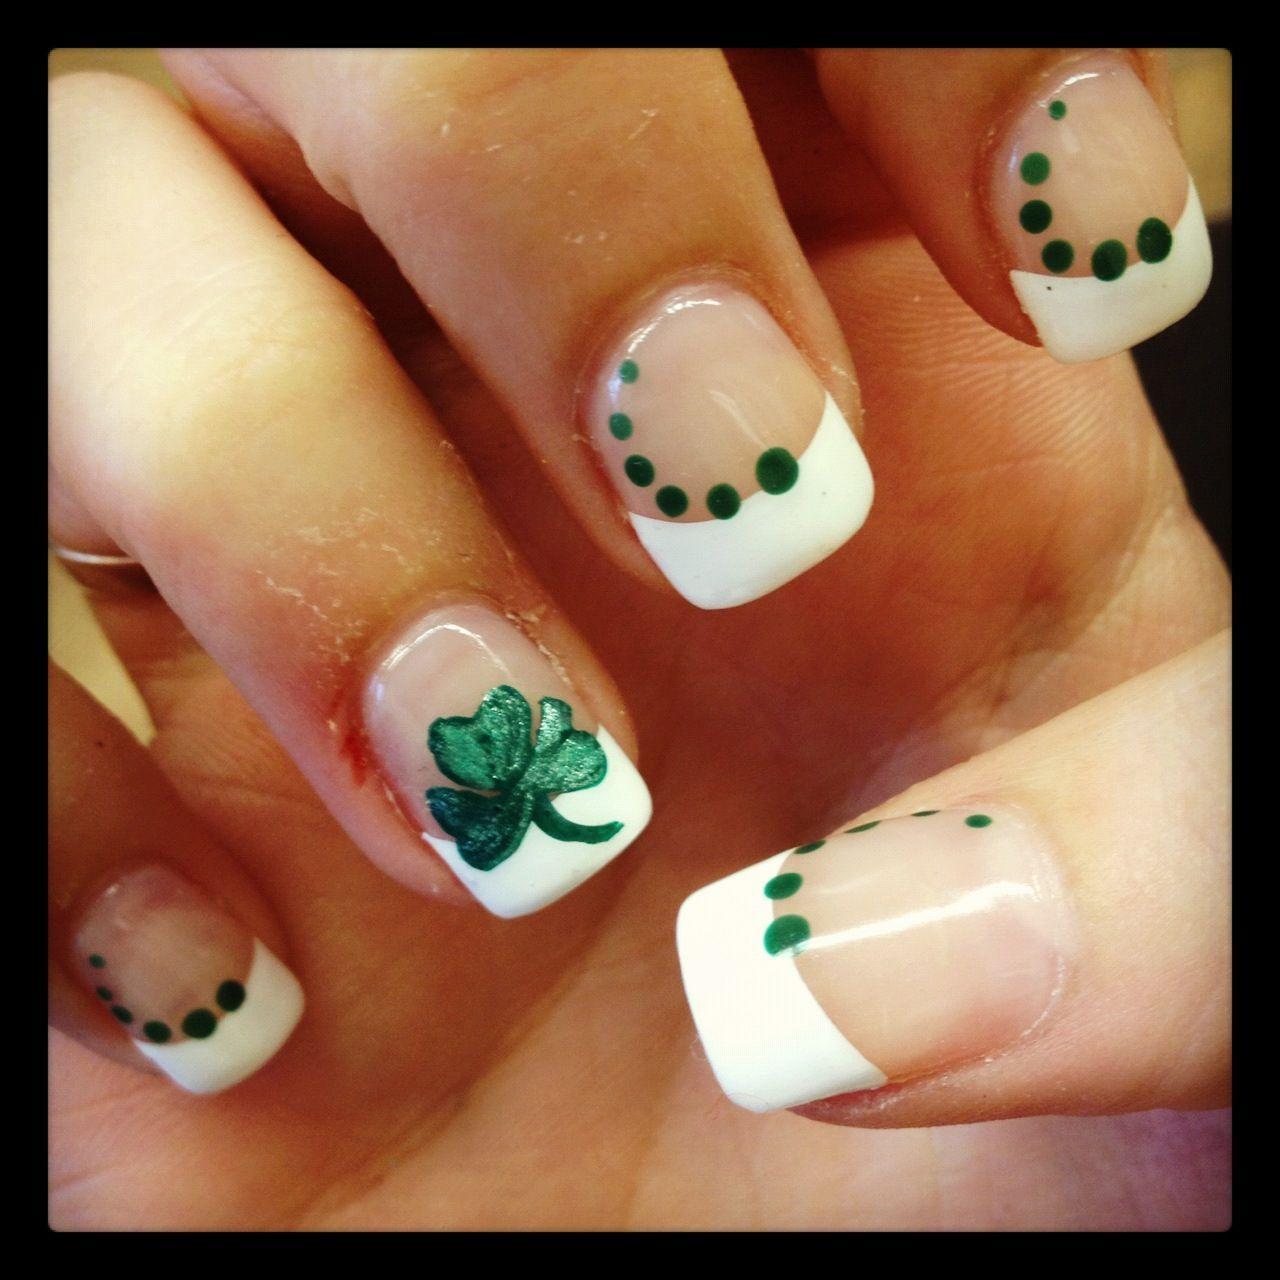 Shamrock nails French Tip Nail Designs, French Nail Art, French Tip Nails,  Nail - Shamrock Nails Irish Nails, Nail Designs, Nail Art